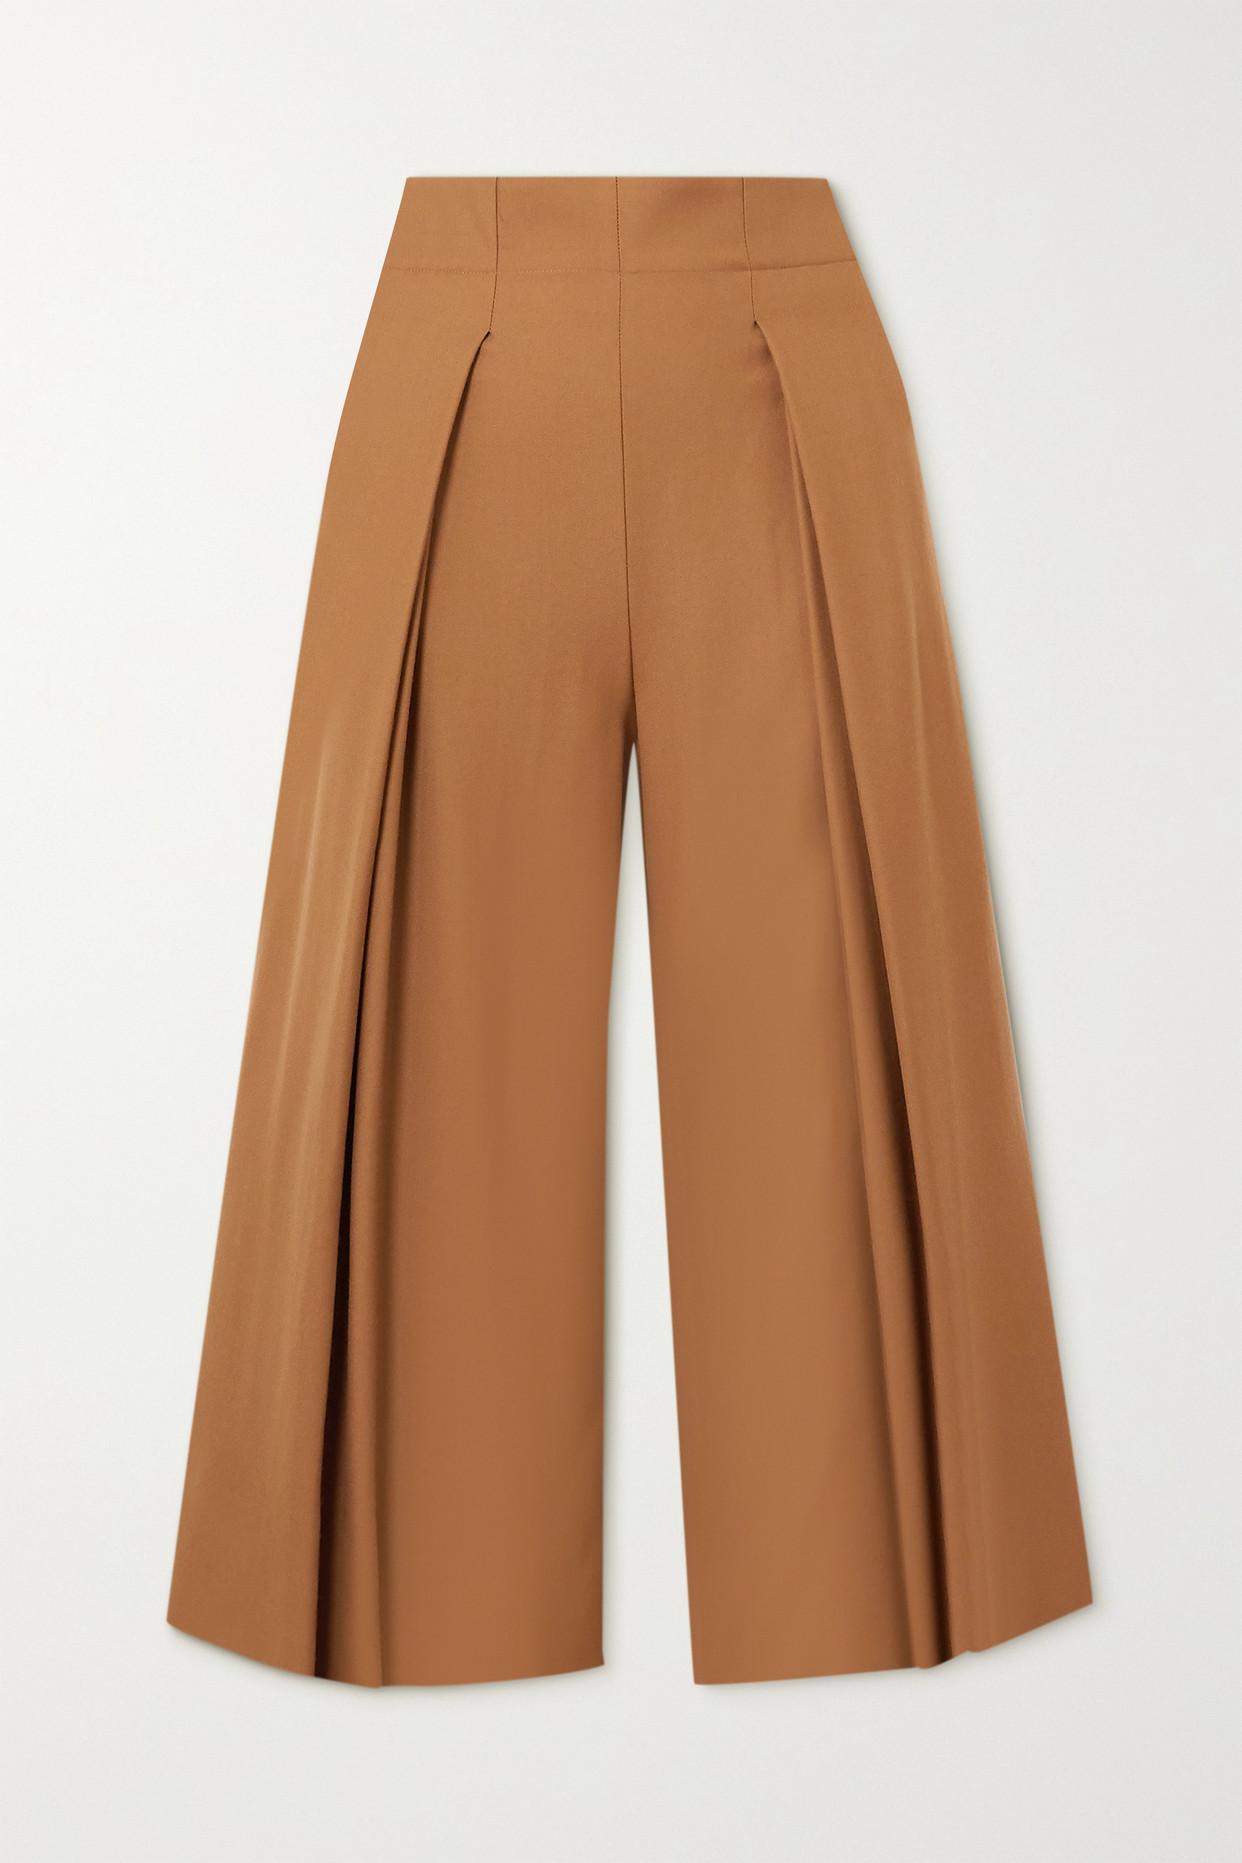 YOOX NET-A-PORTER FOR THE PRINCE'S FOUNDATION - 褶裥美利奴羊毛裙裤 - 棕色 - IT38